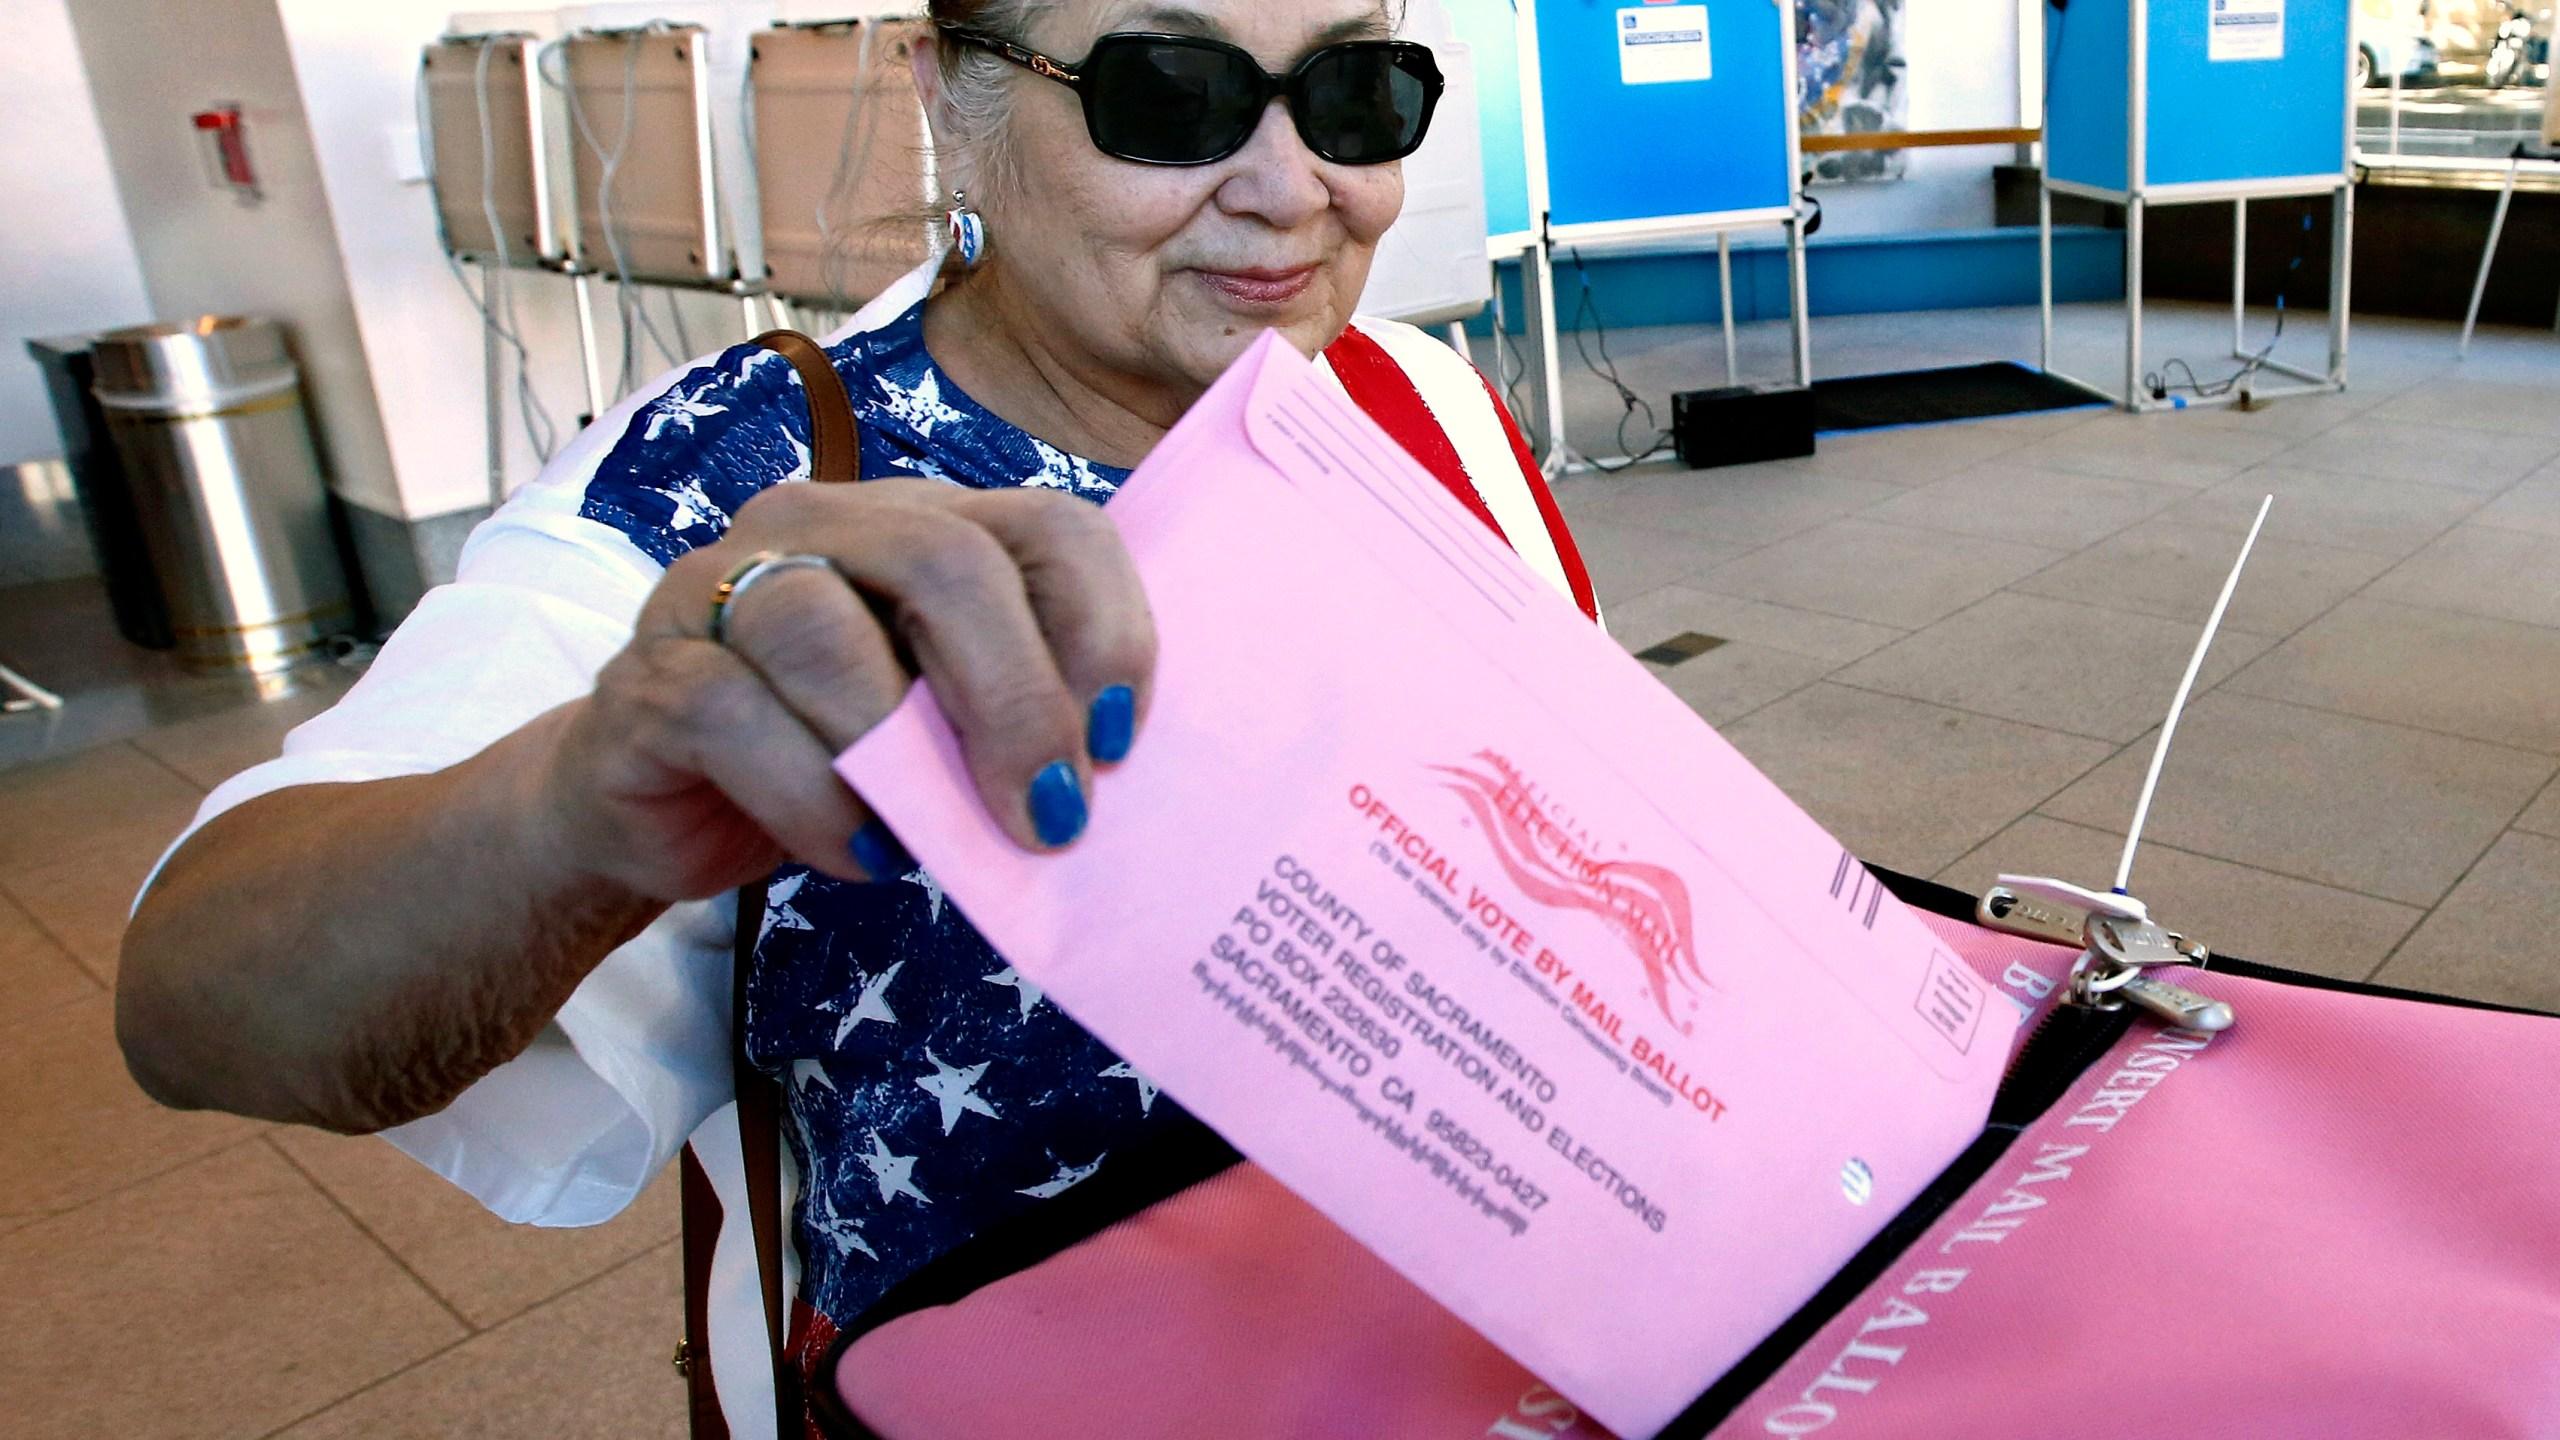 Election_2018_Voting_California_59118-159532.jpg35465083